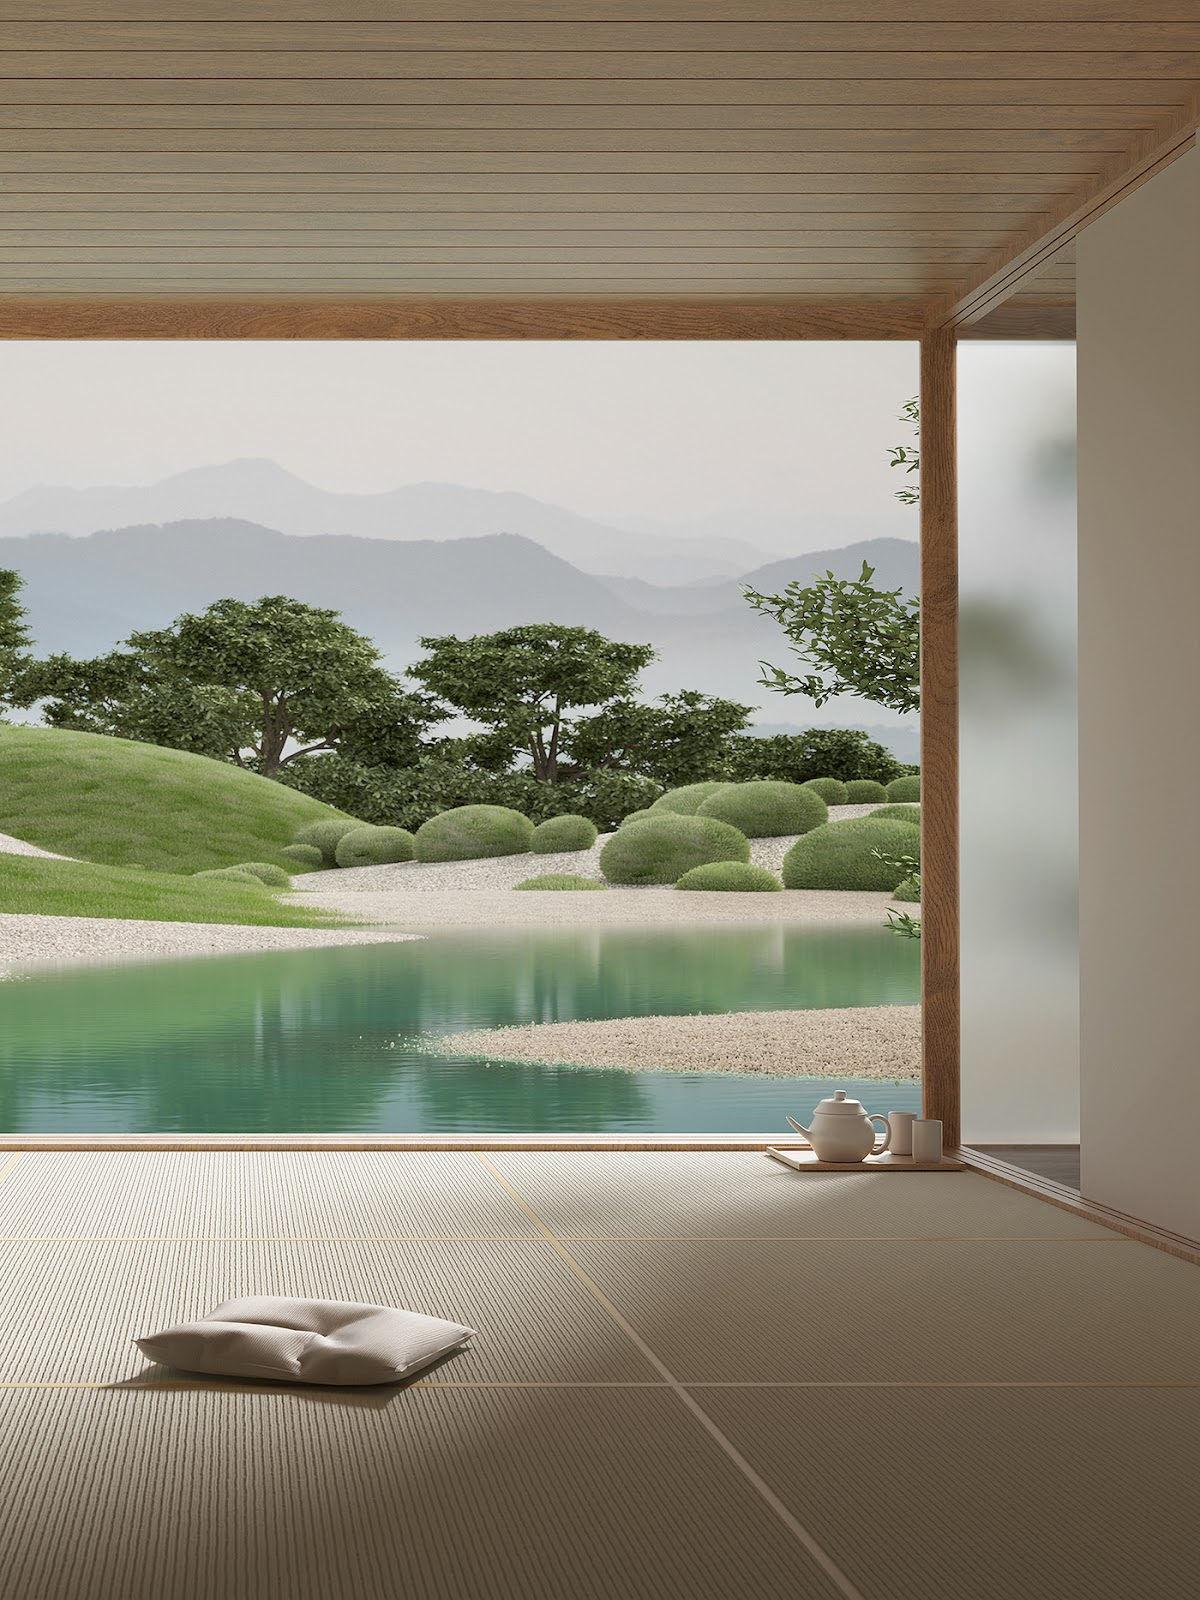 Image may contain: lake, tree and water